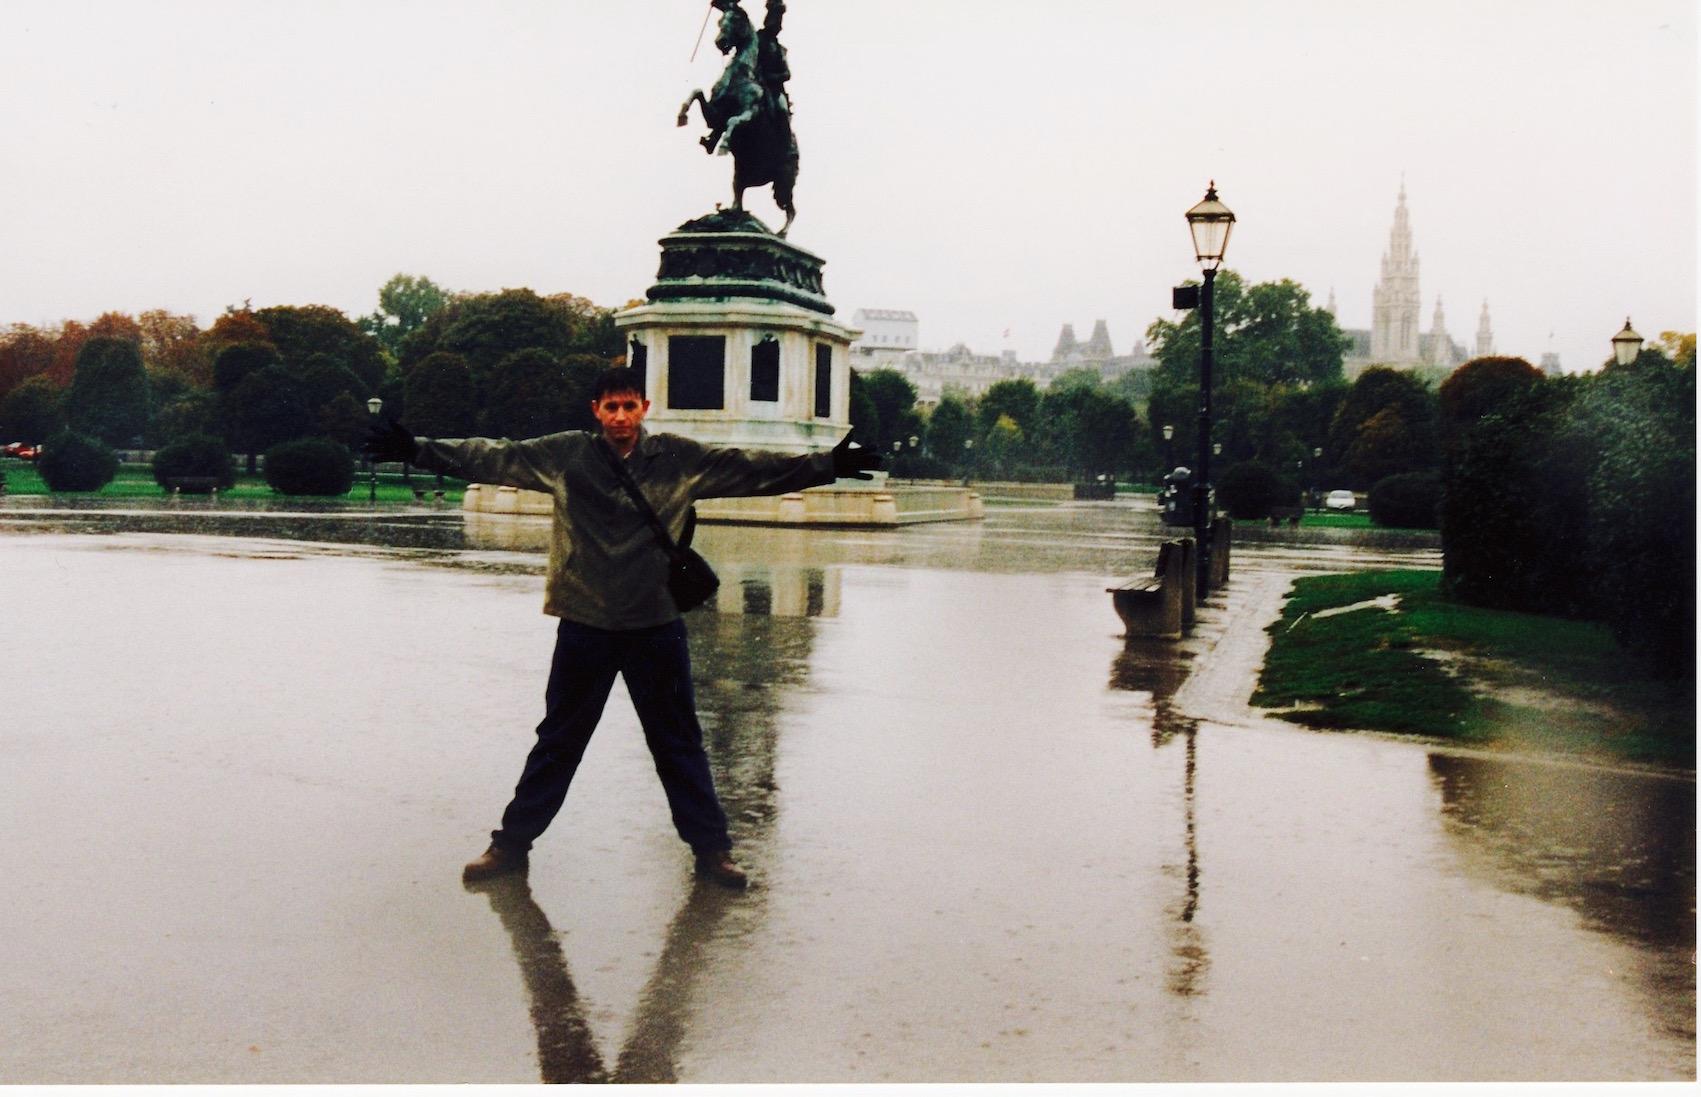 heldenplatz-vienna-rainy-day